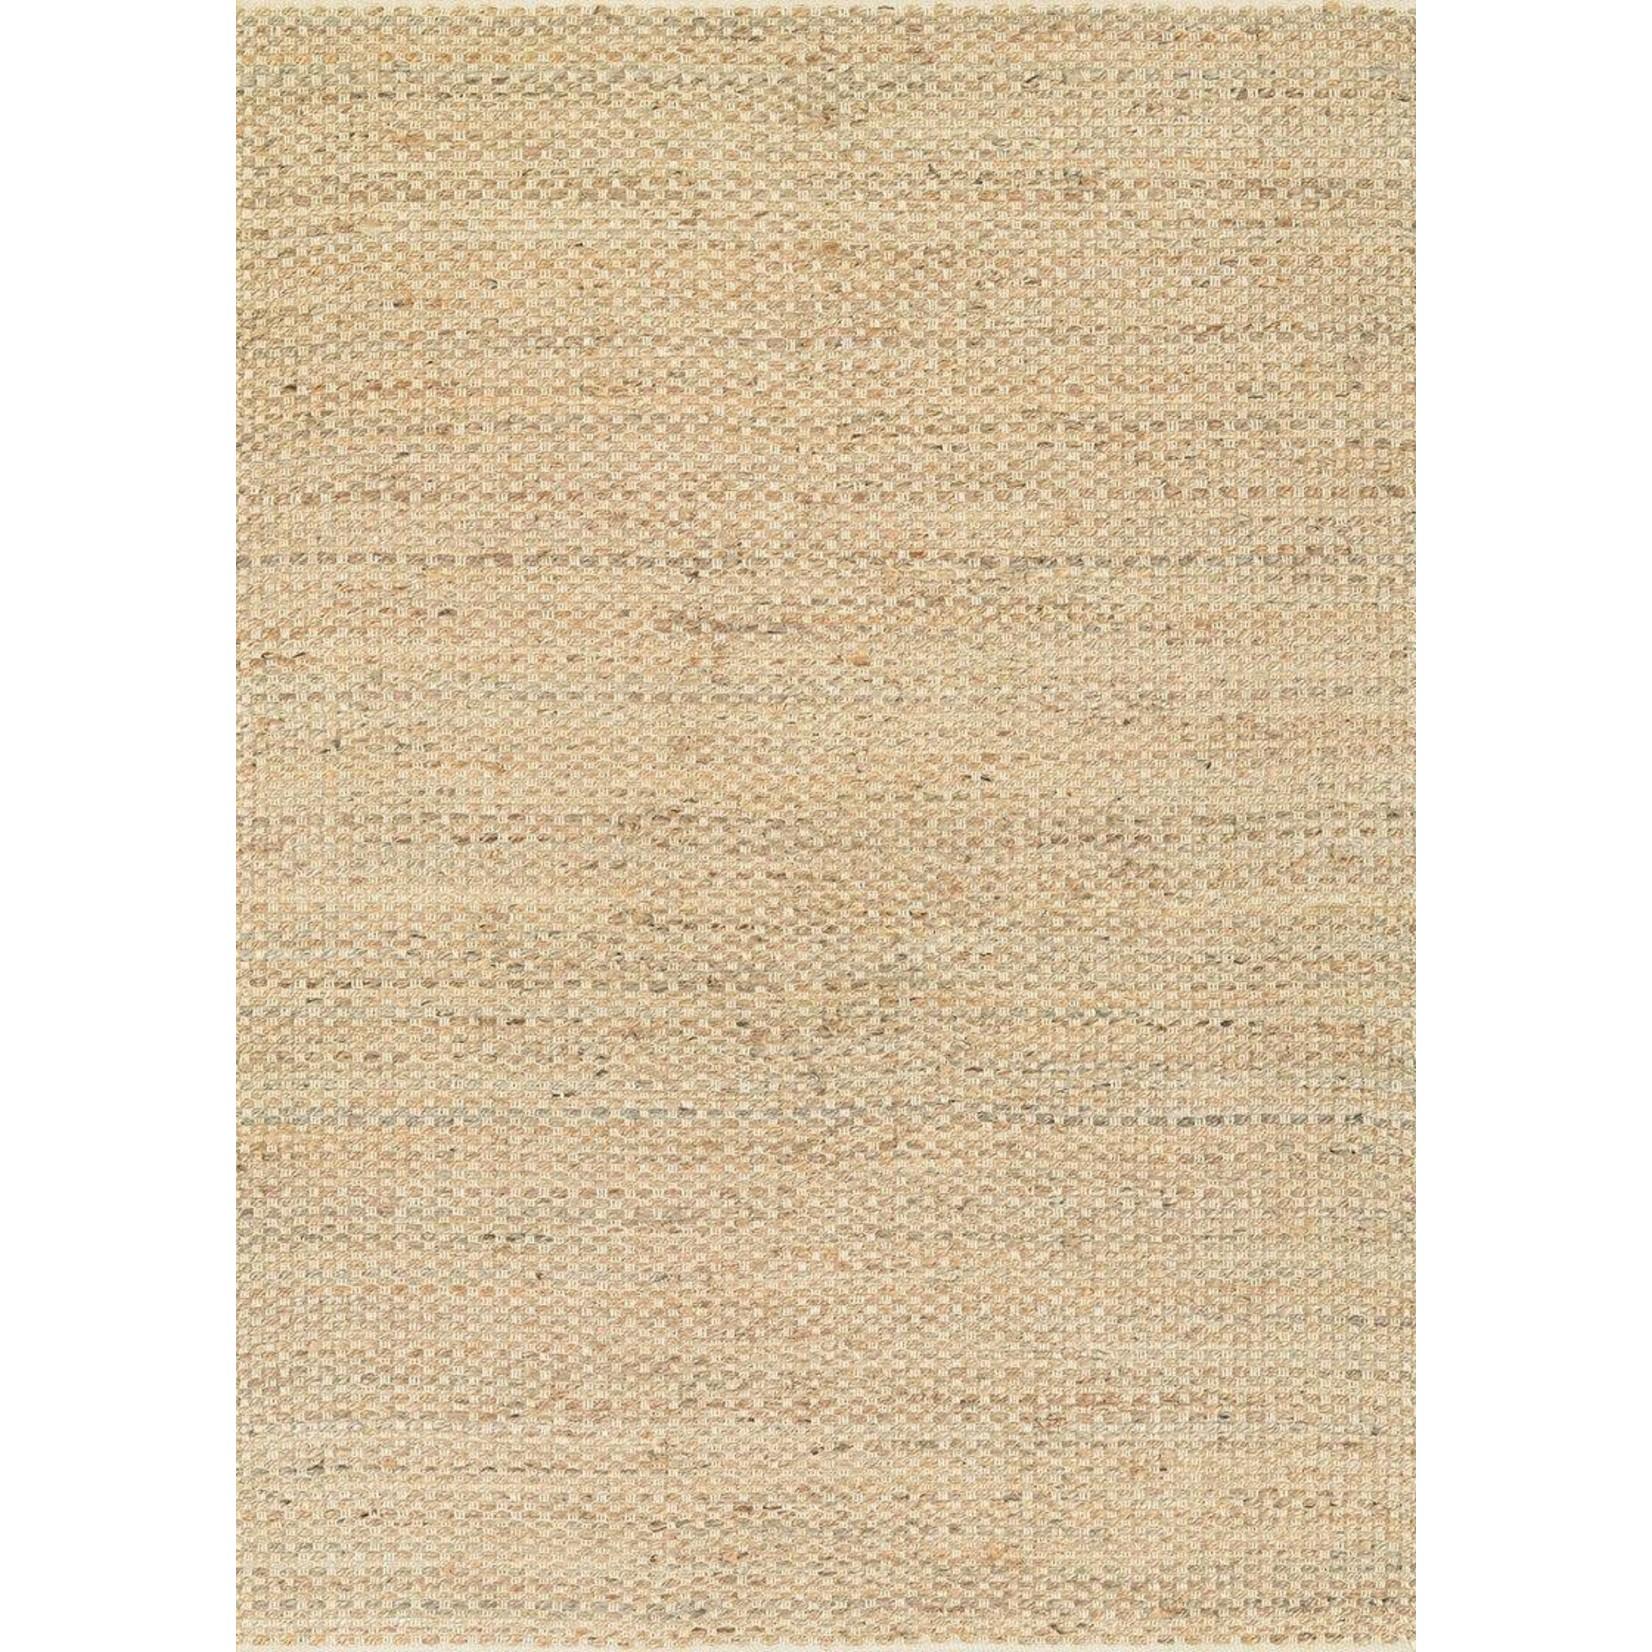 *5' x 8' - Fairfax Hand-Loomed Cotton Beige Area Rug